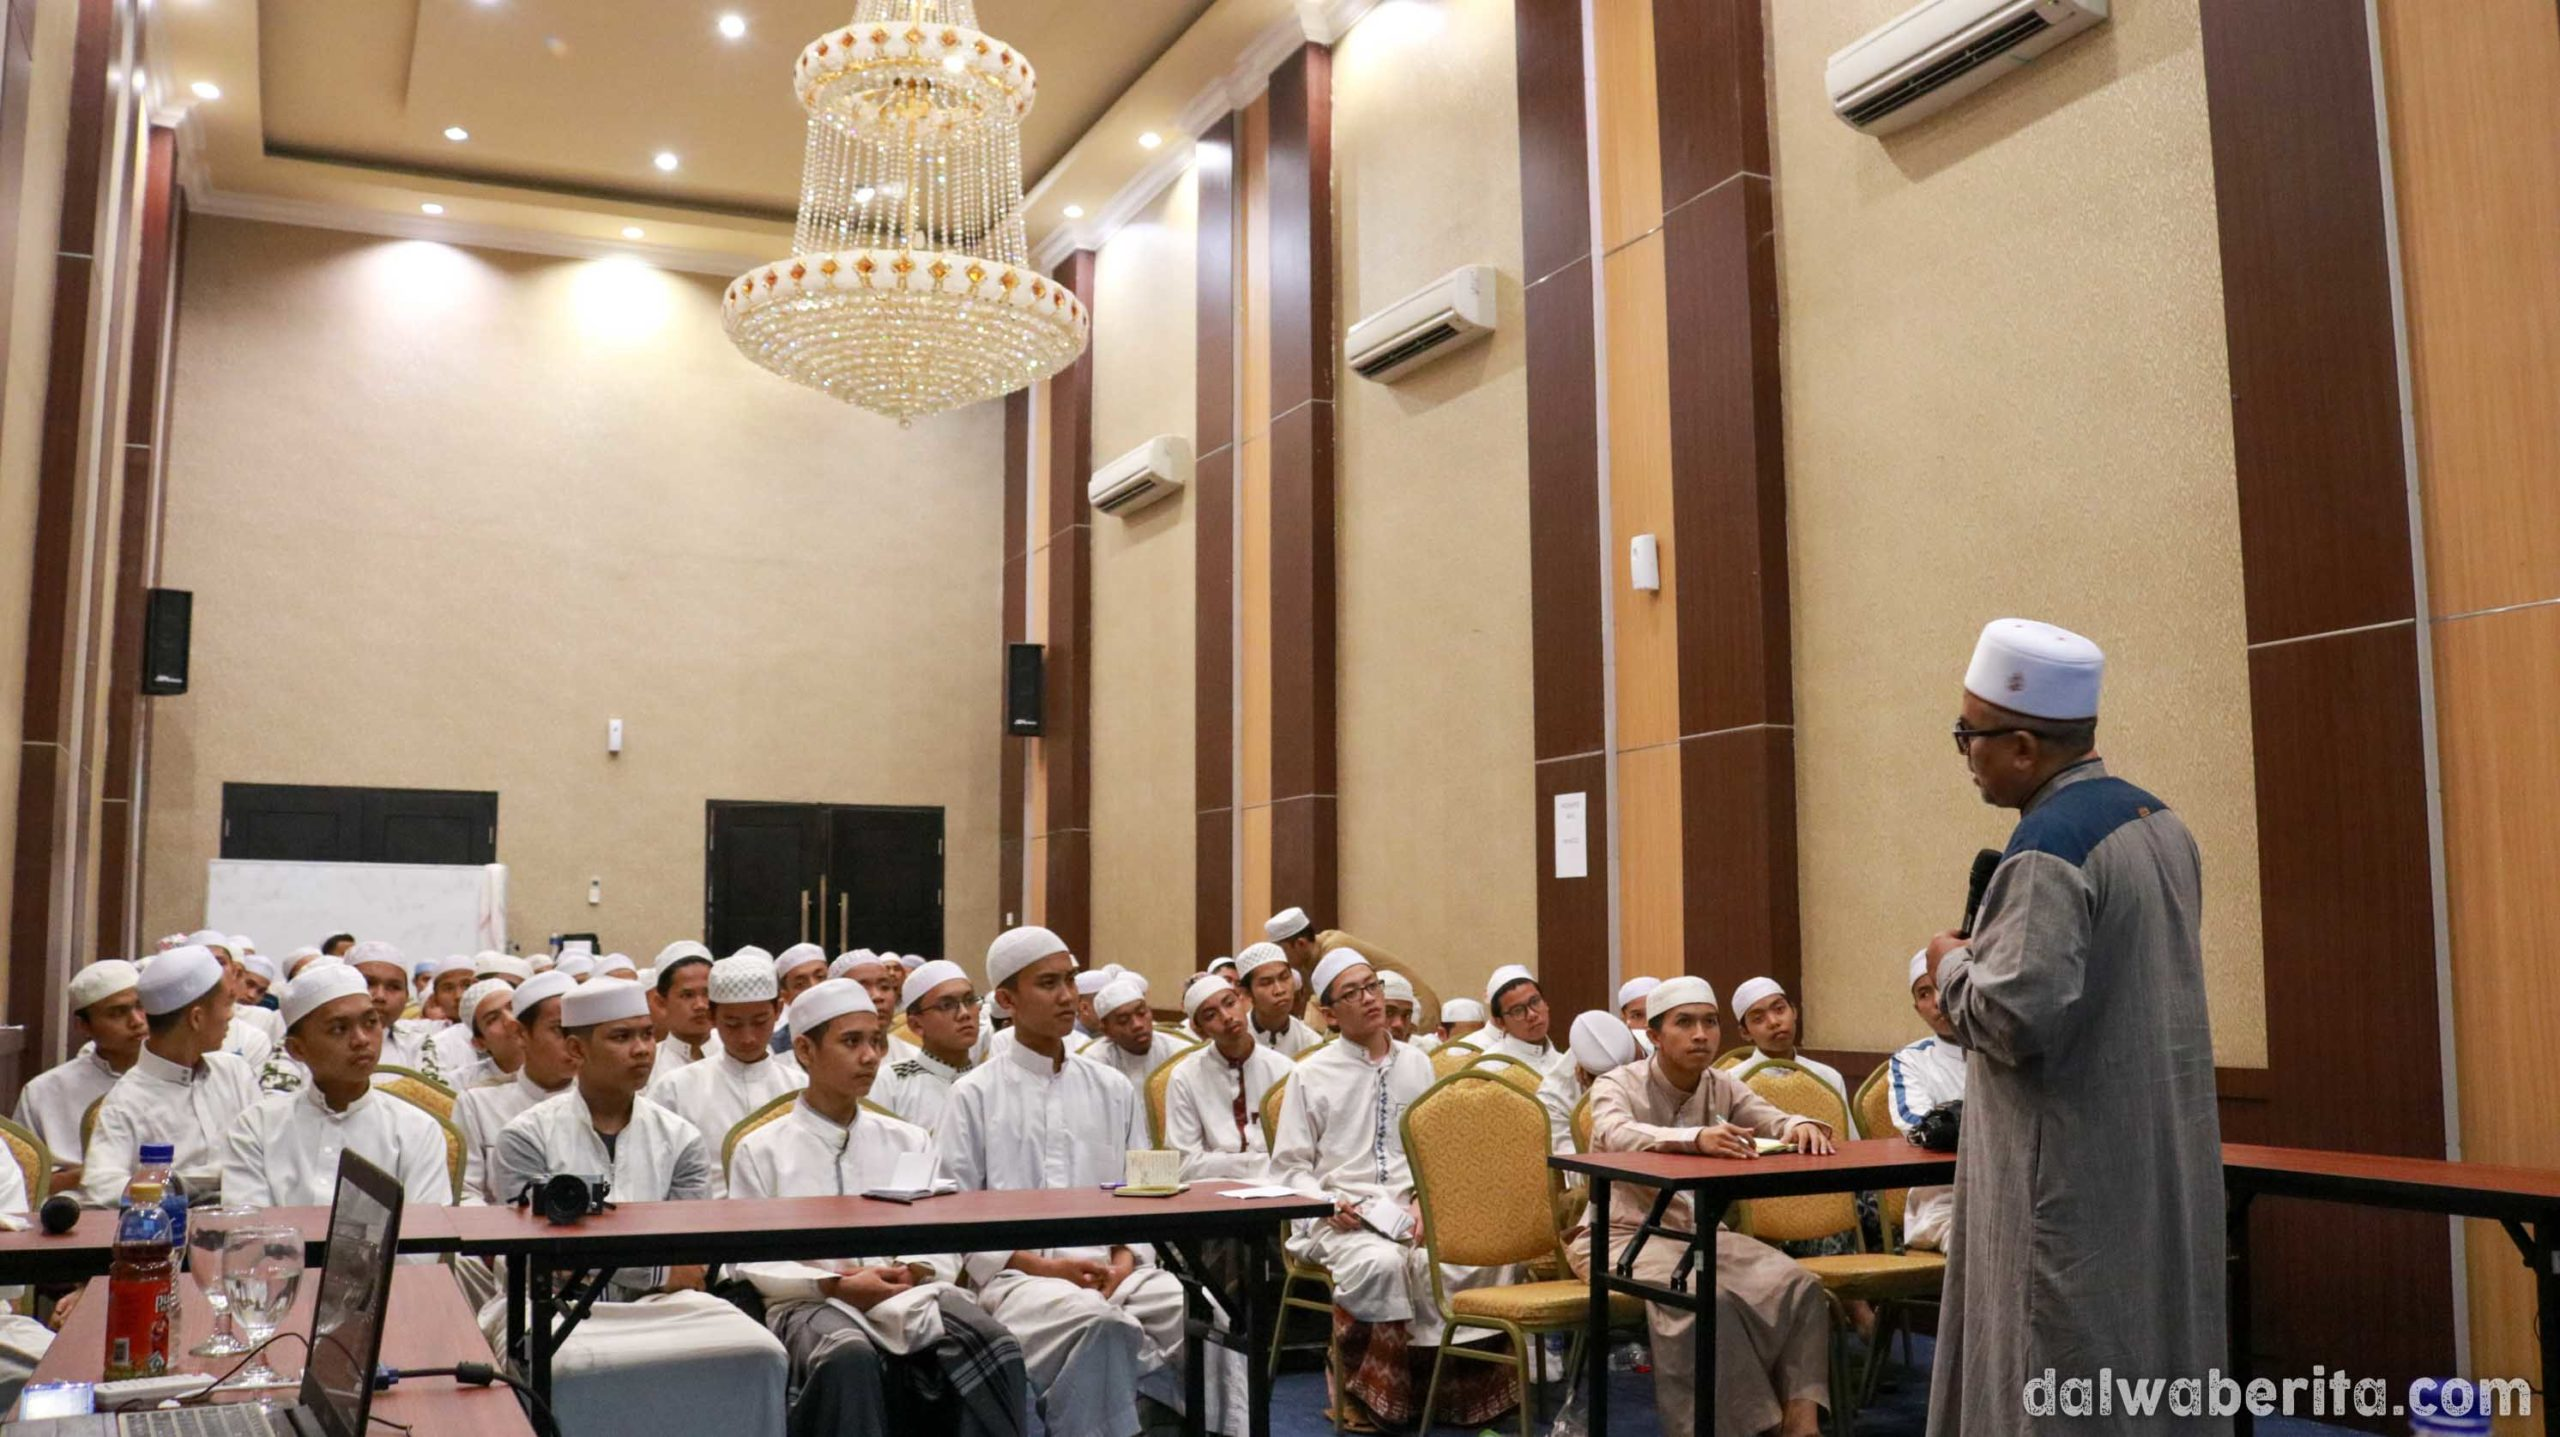 Jelang Liburan, ISKAB Adakan Seminar Kepemimpinan Dan Dakwah